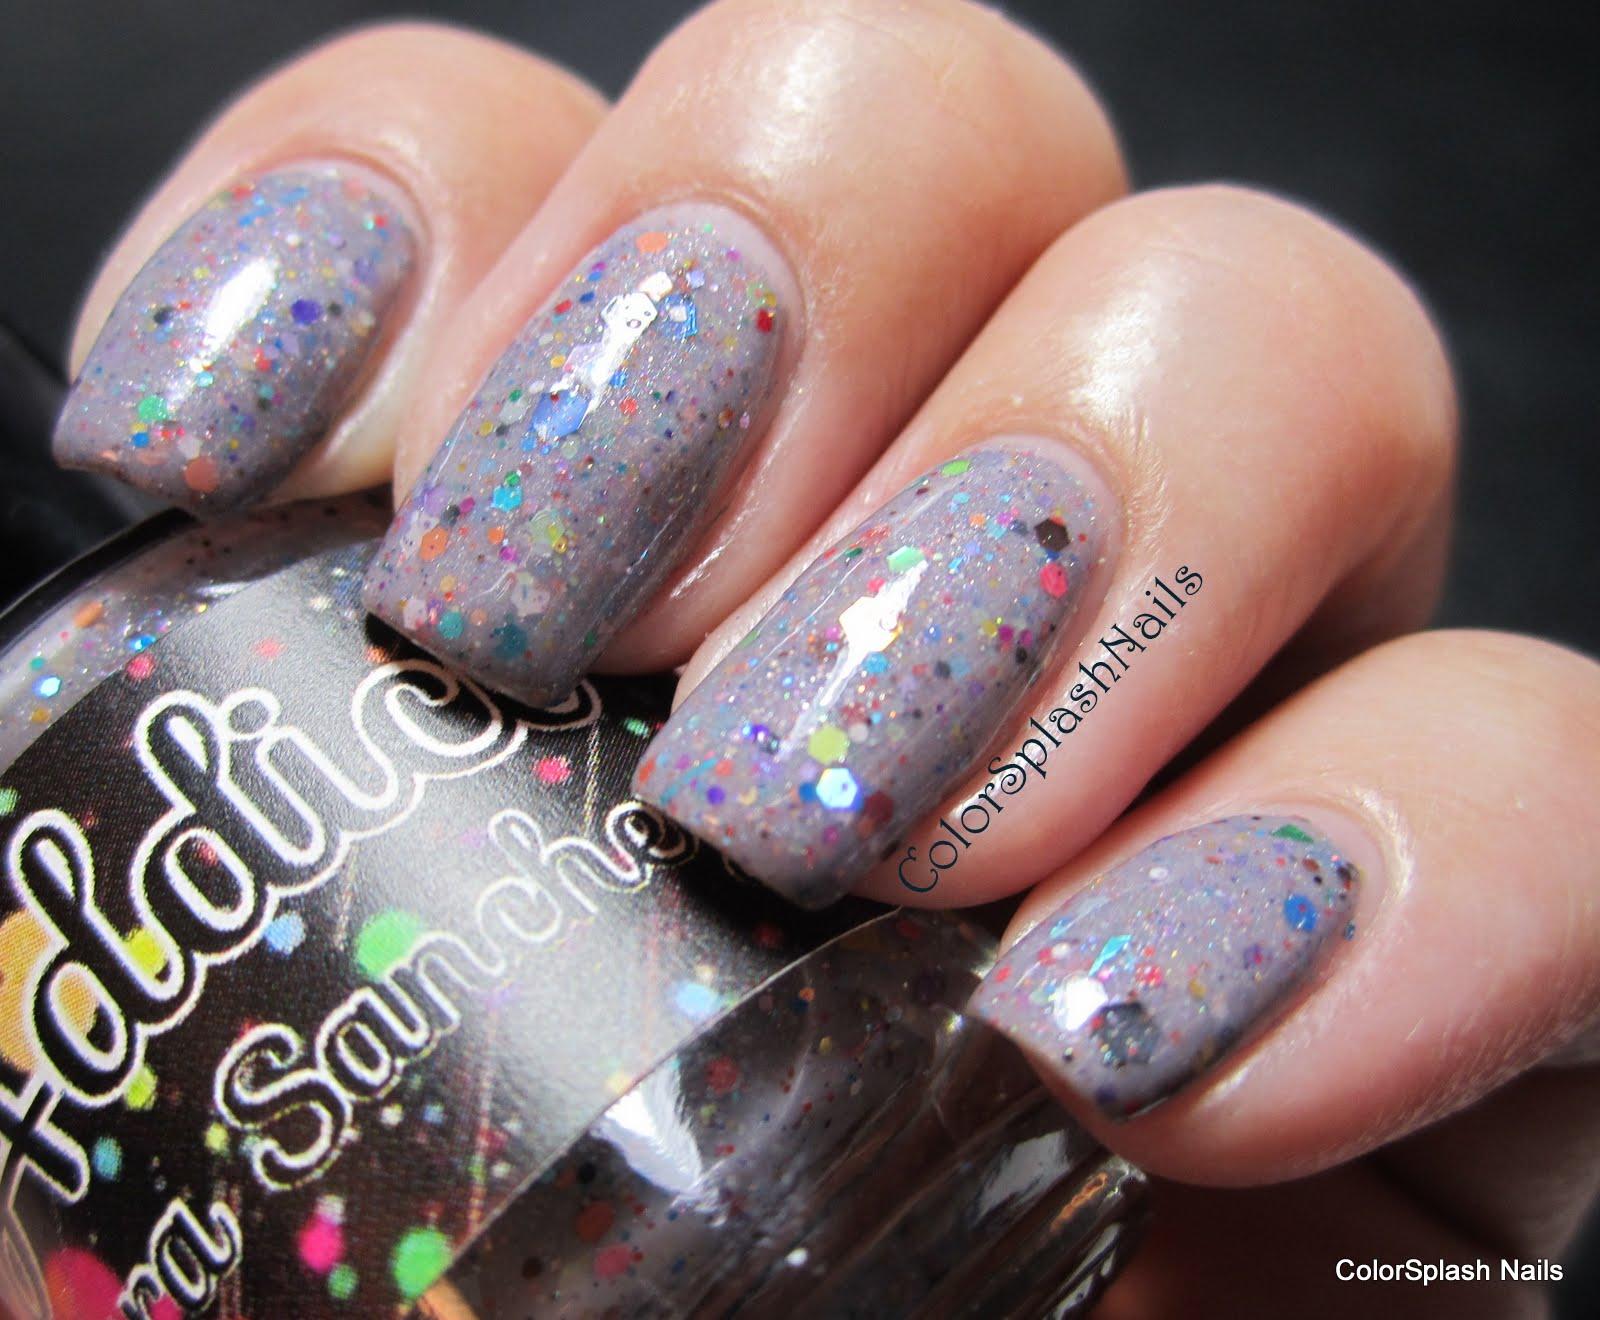 Colorsplash Nails: Polish Addict Neon Nights and Rainbow Concrete